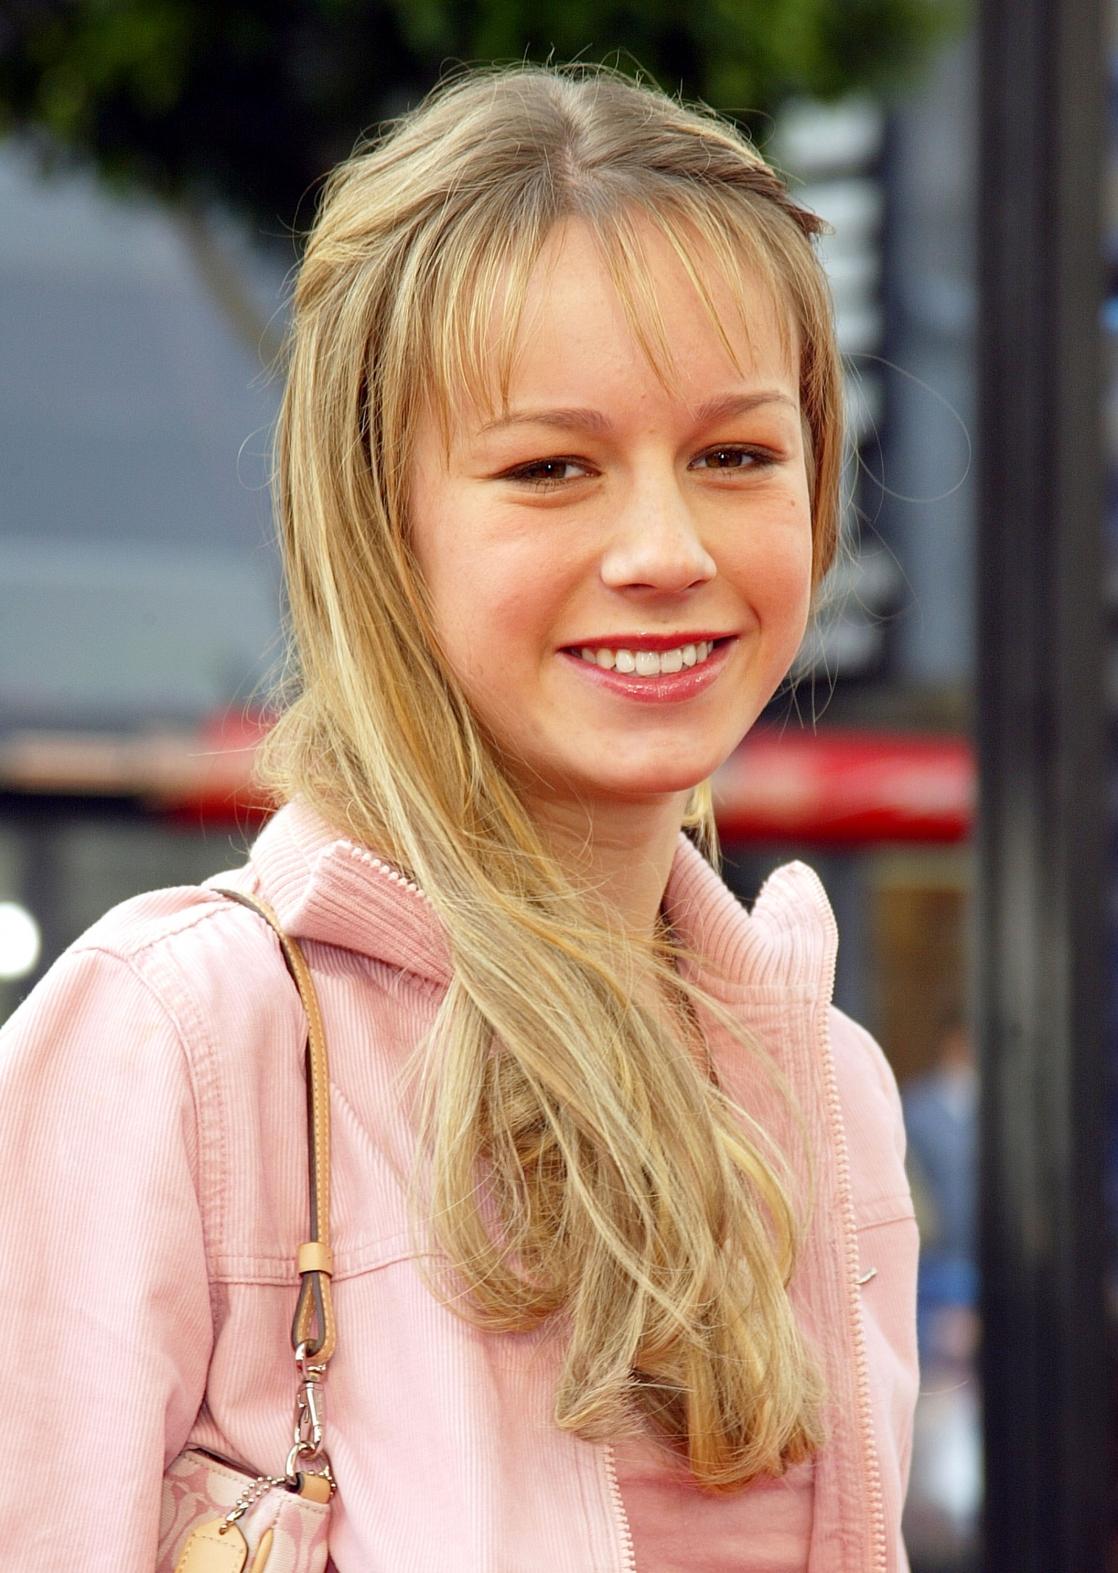 brie larson when she was teen